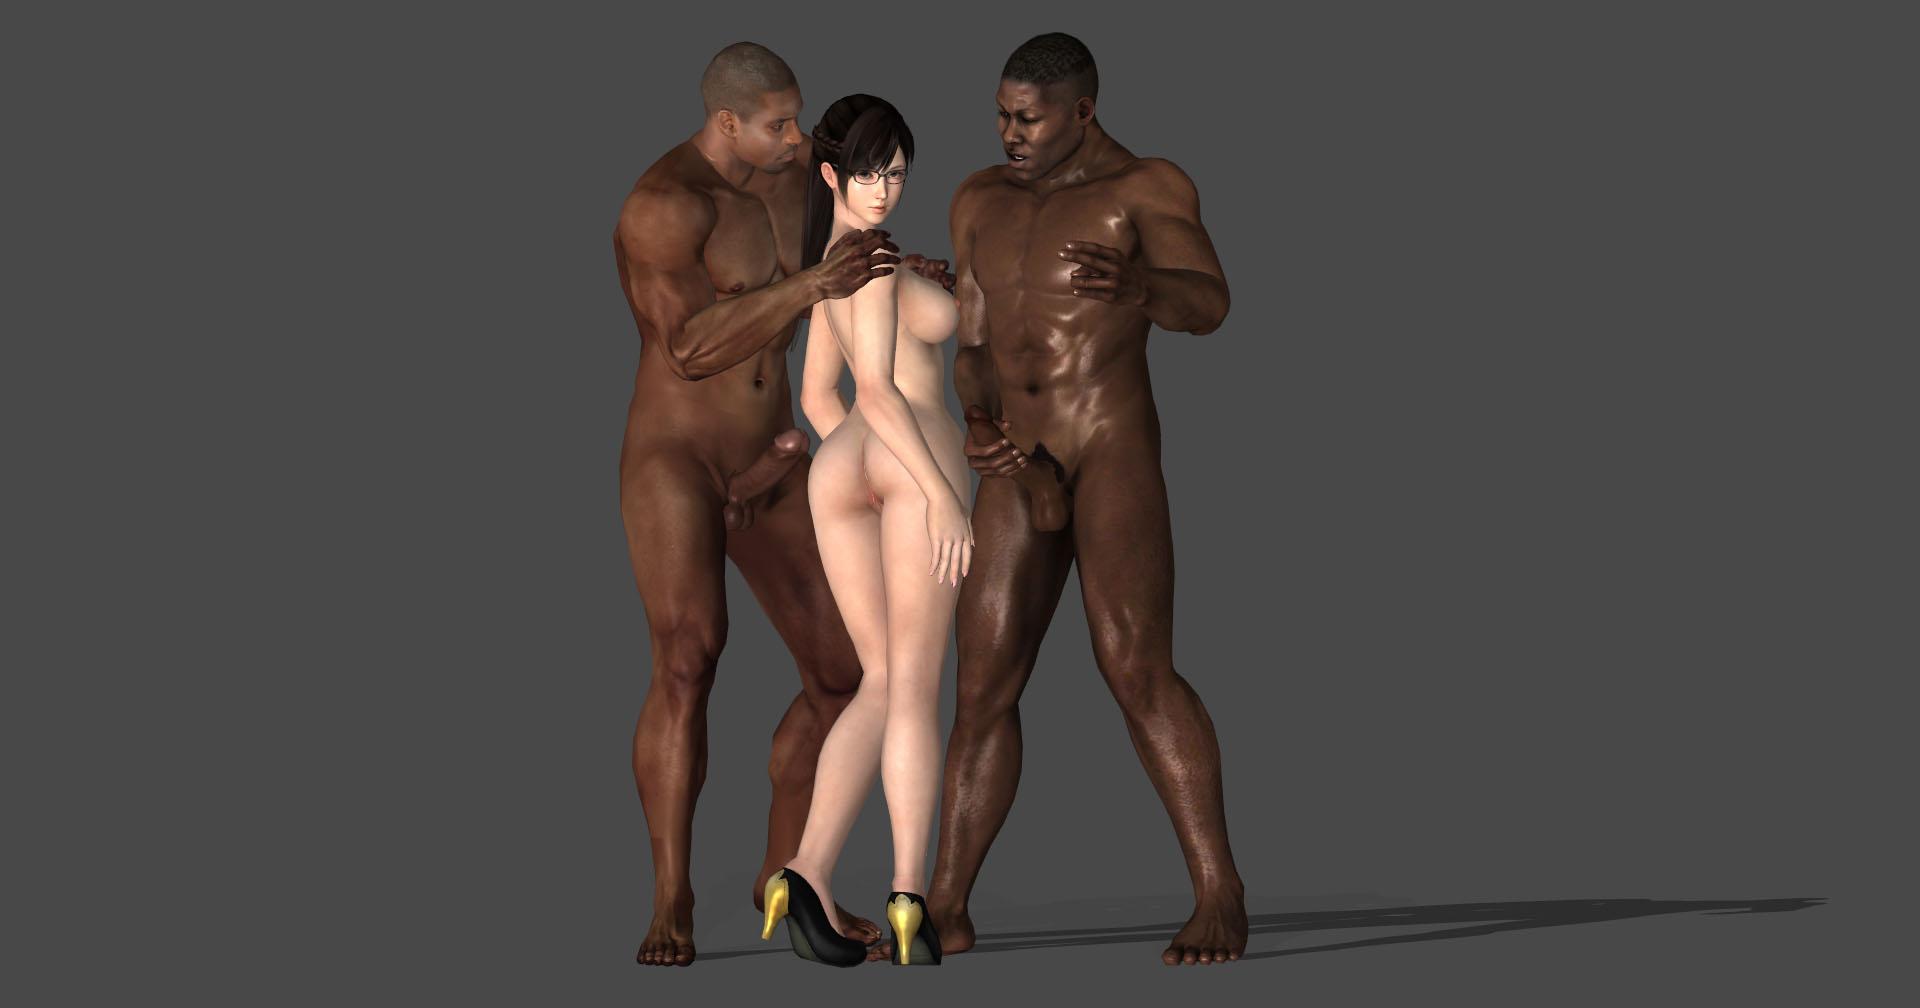 kokoro_making_porn_0003_layer_1_by_bitemonsters-dbhglbf.jpg